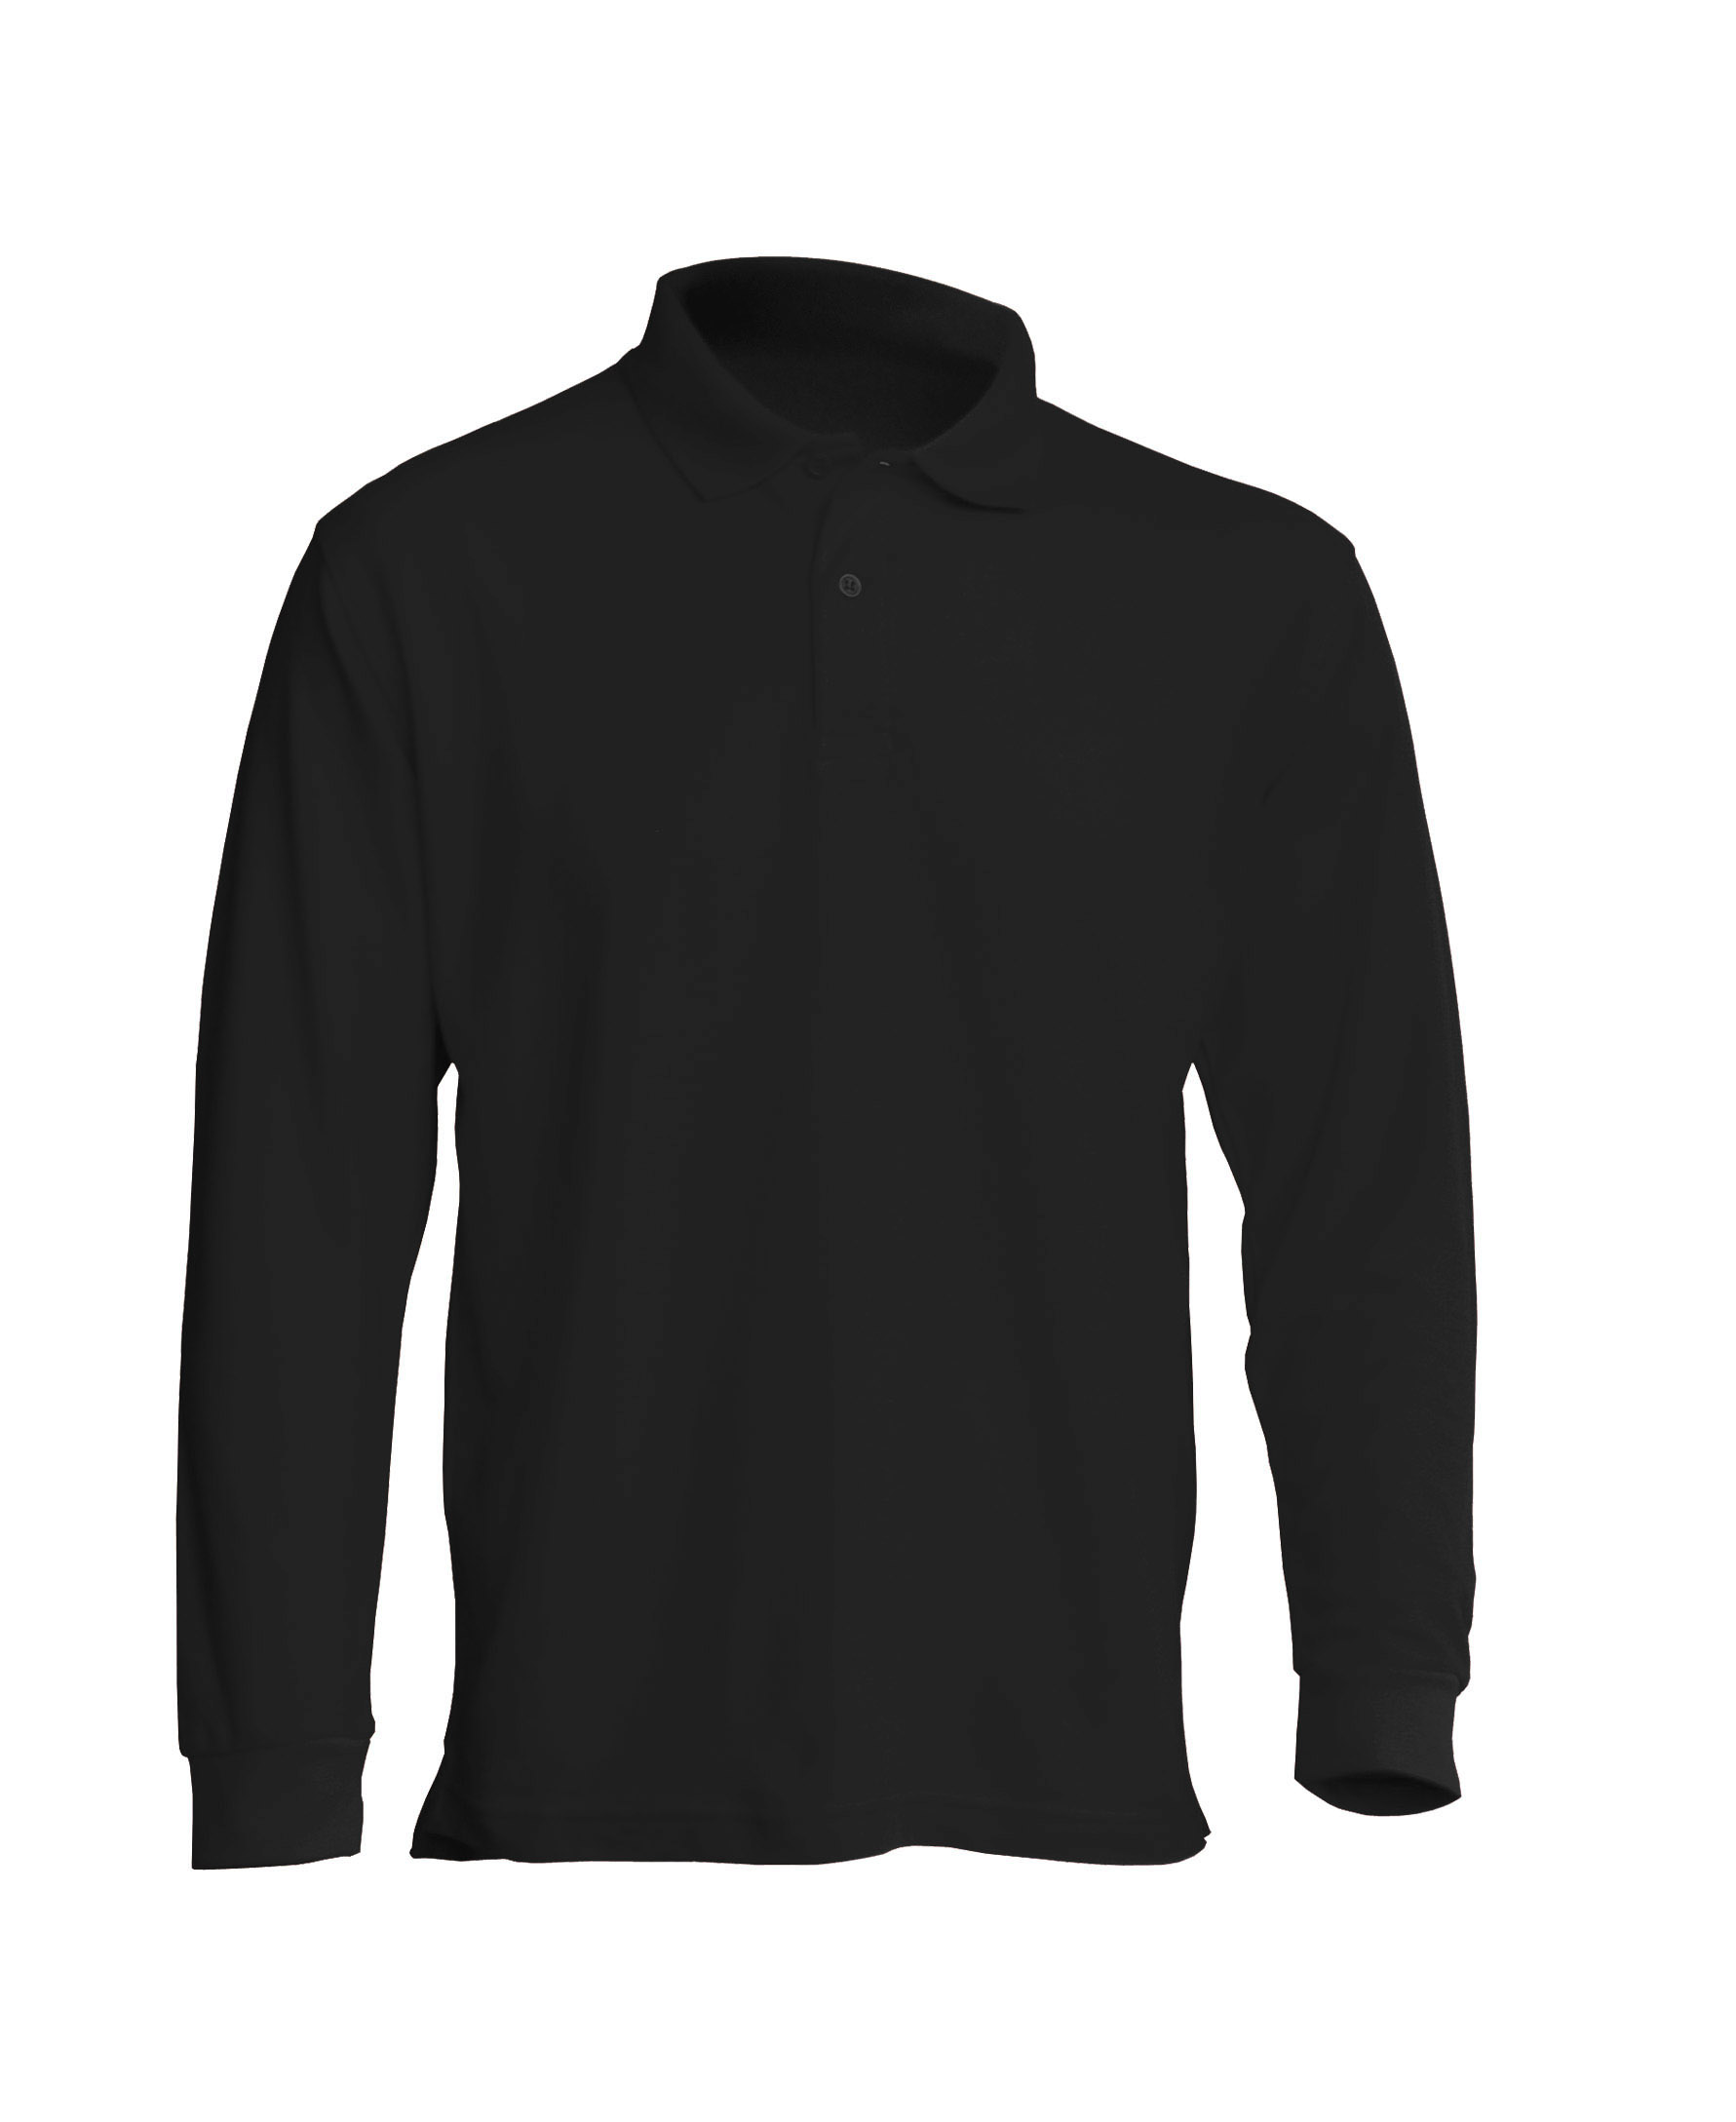 Muška polo majica dugih rukava, crna